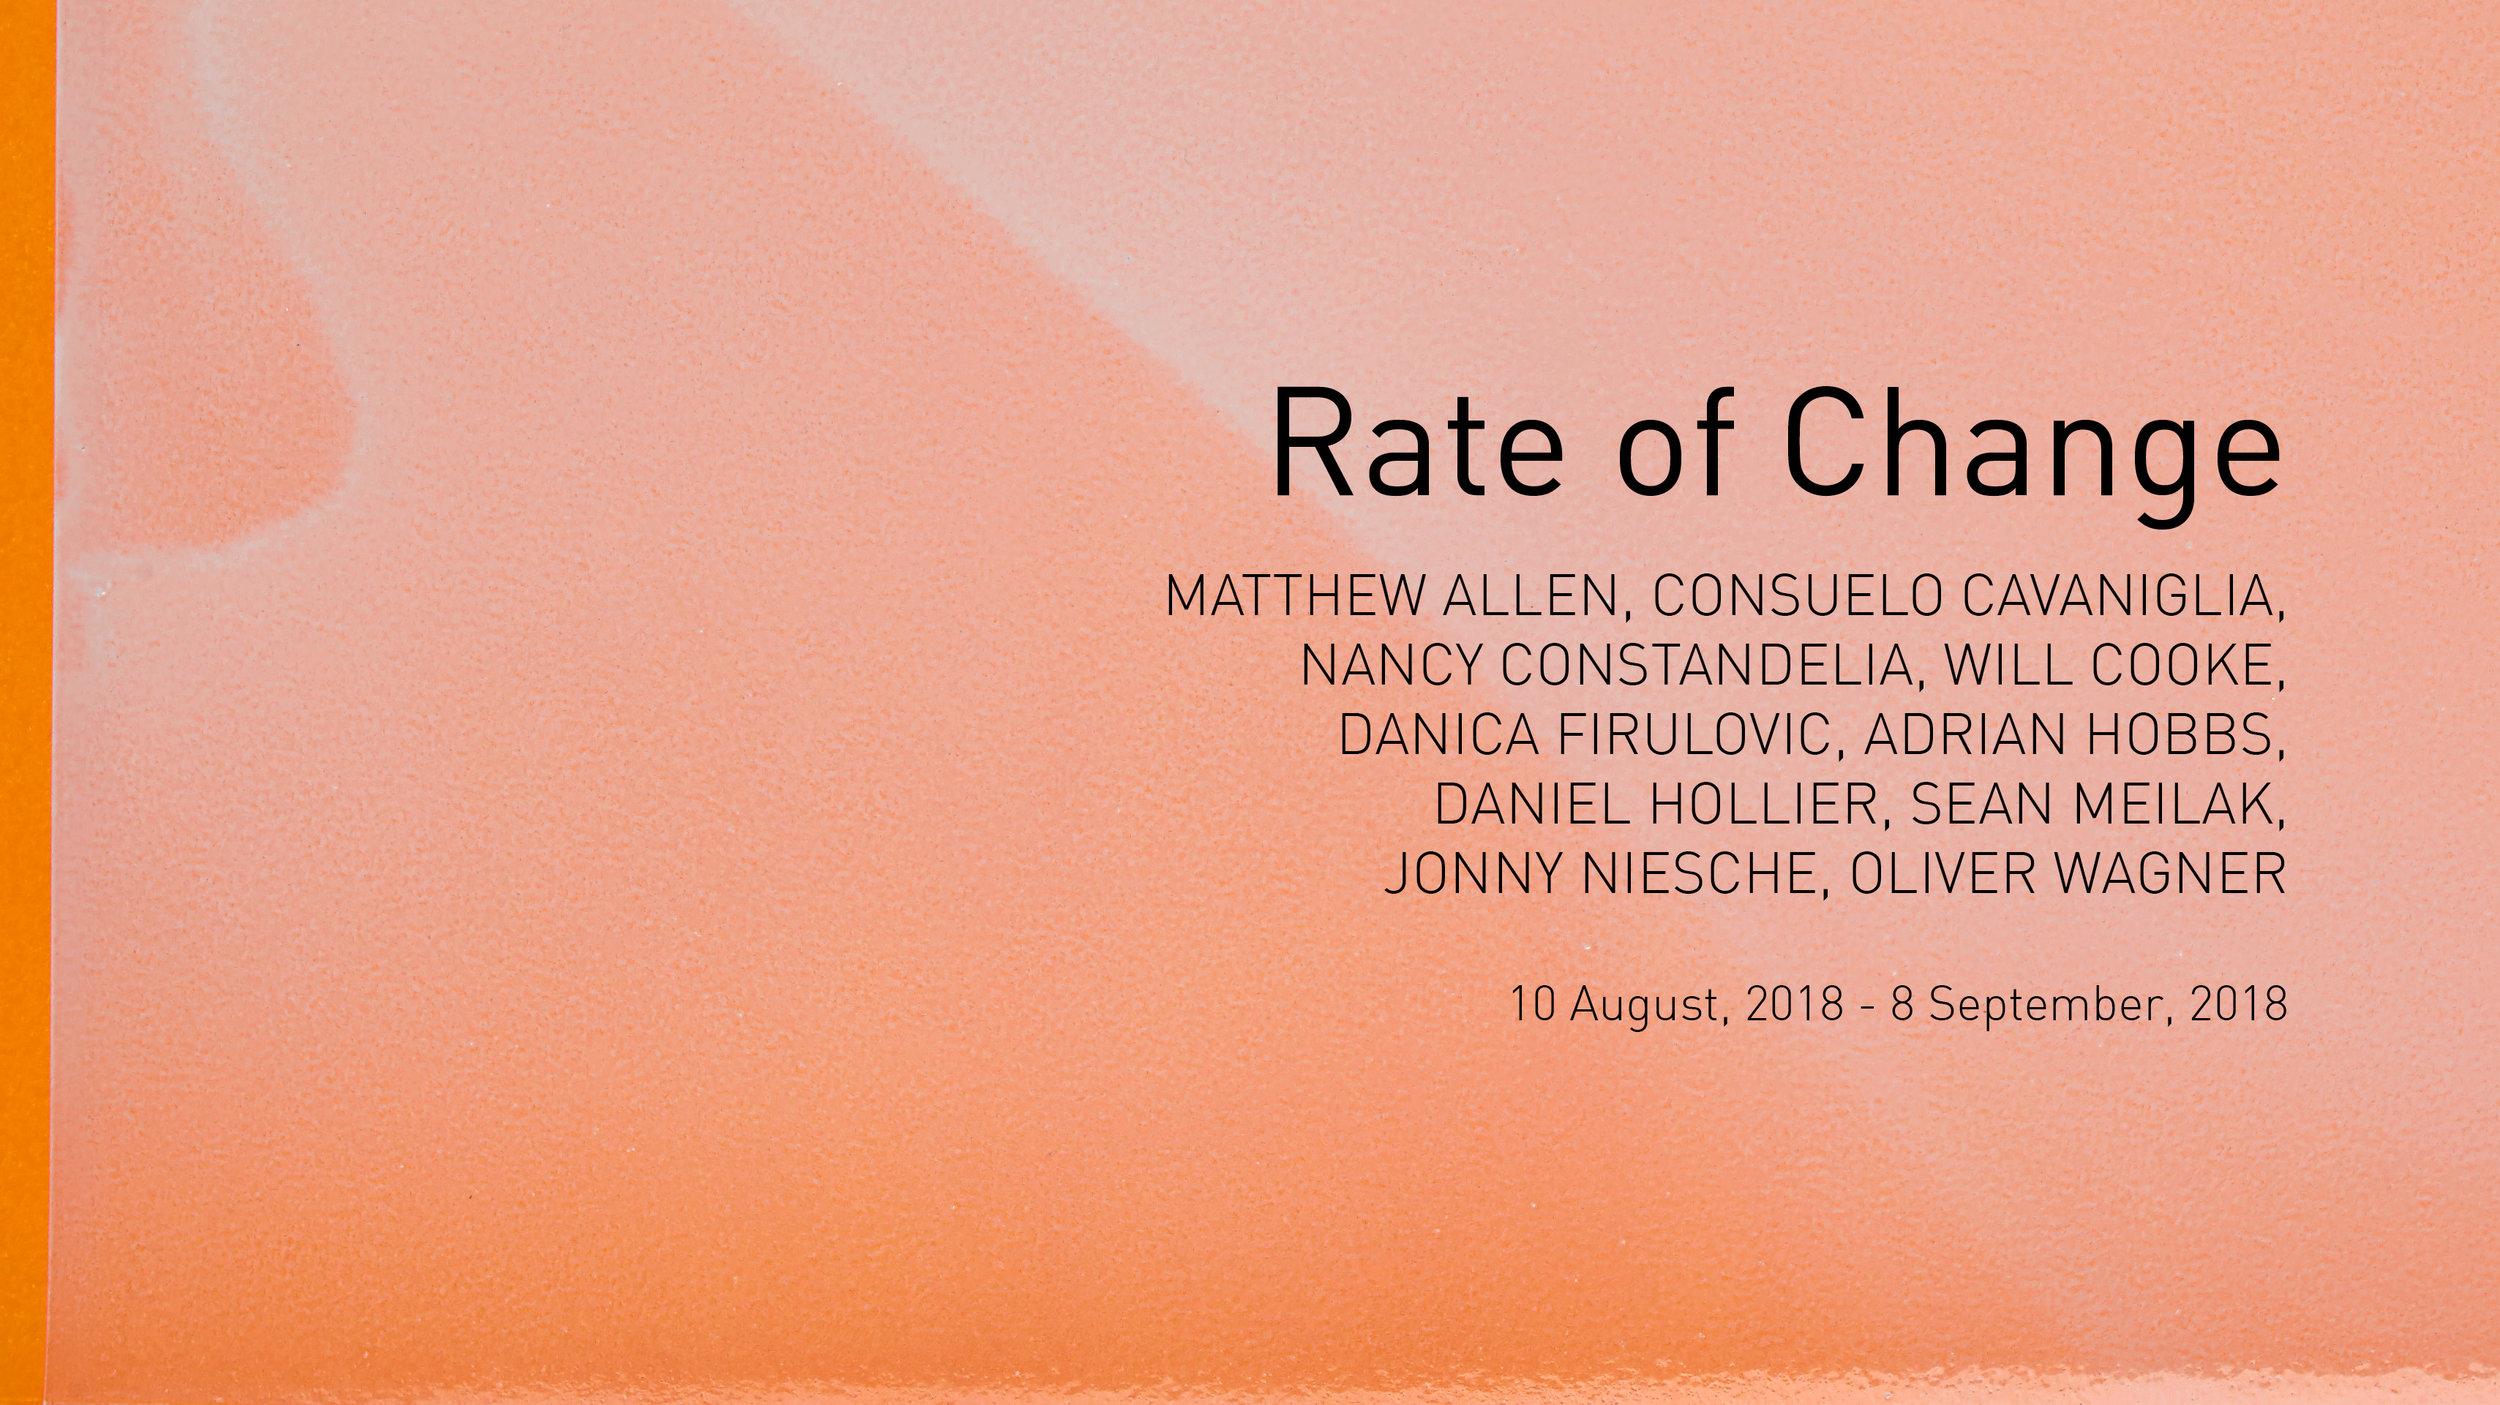 Rate of Change - Facebook Banner.jpg